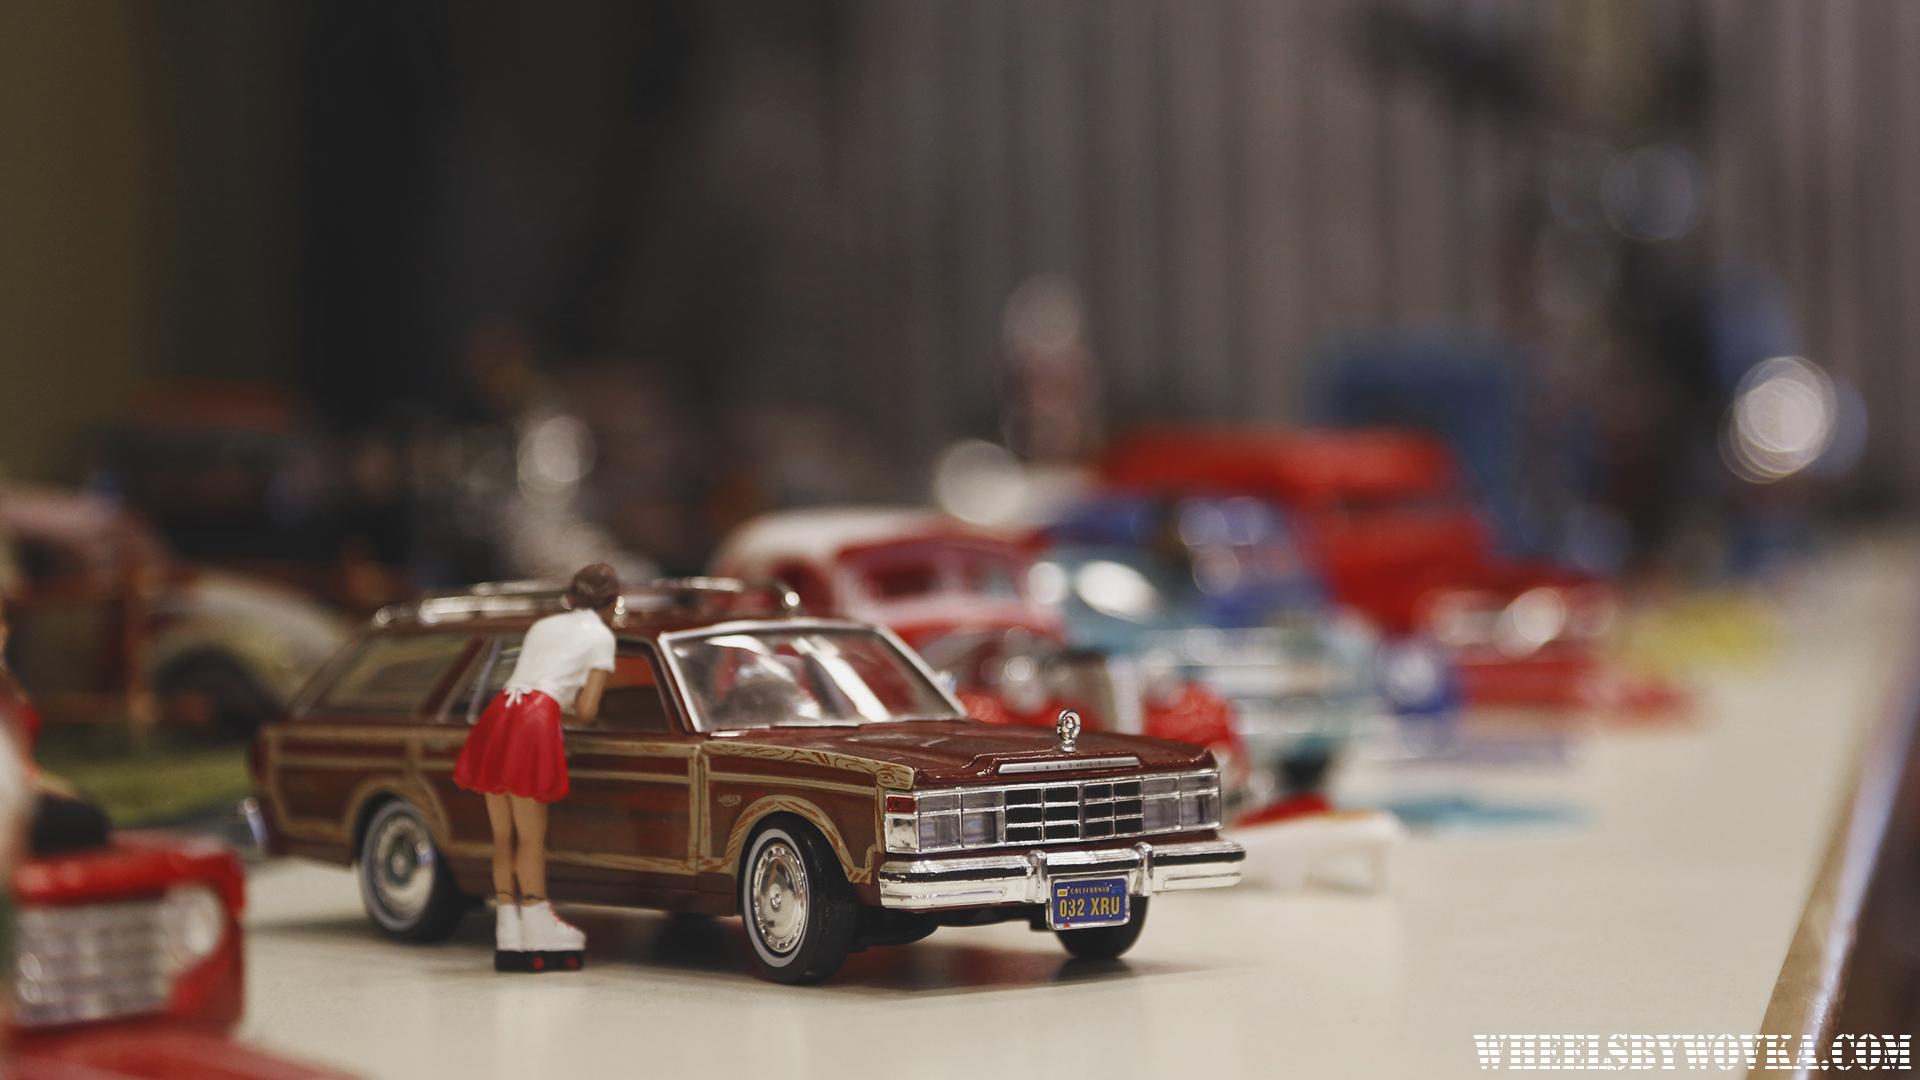 model-car-show-frankfurt-2017-128